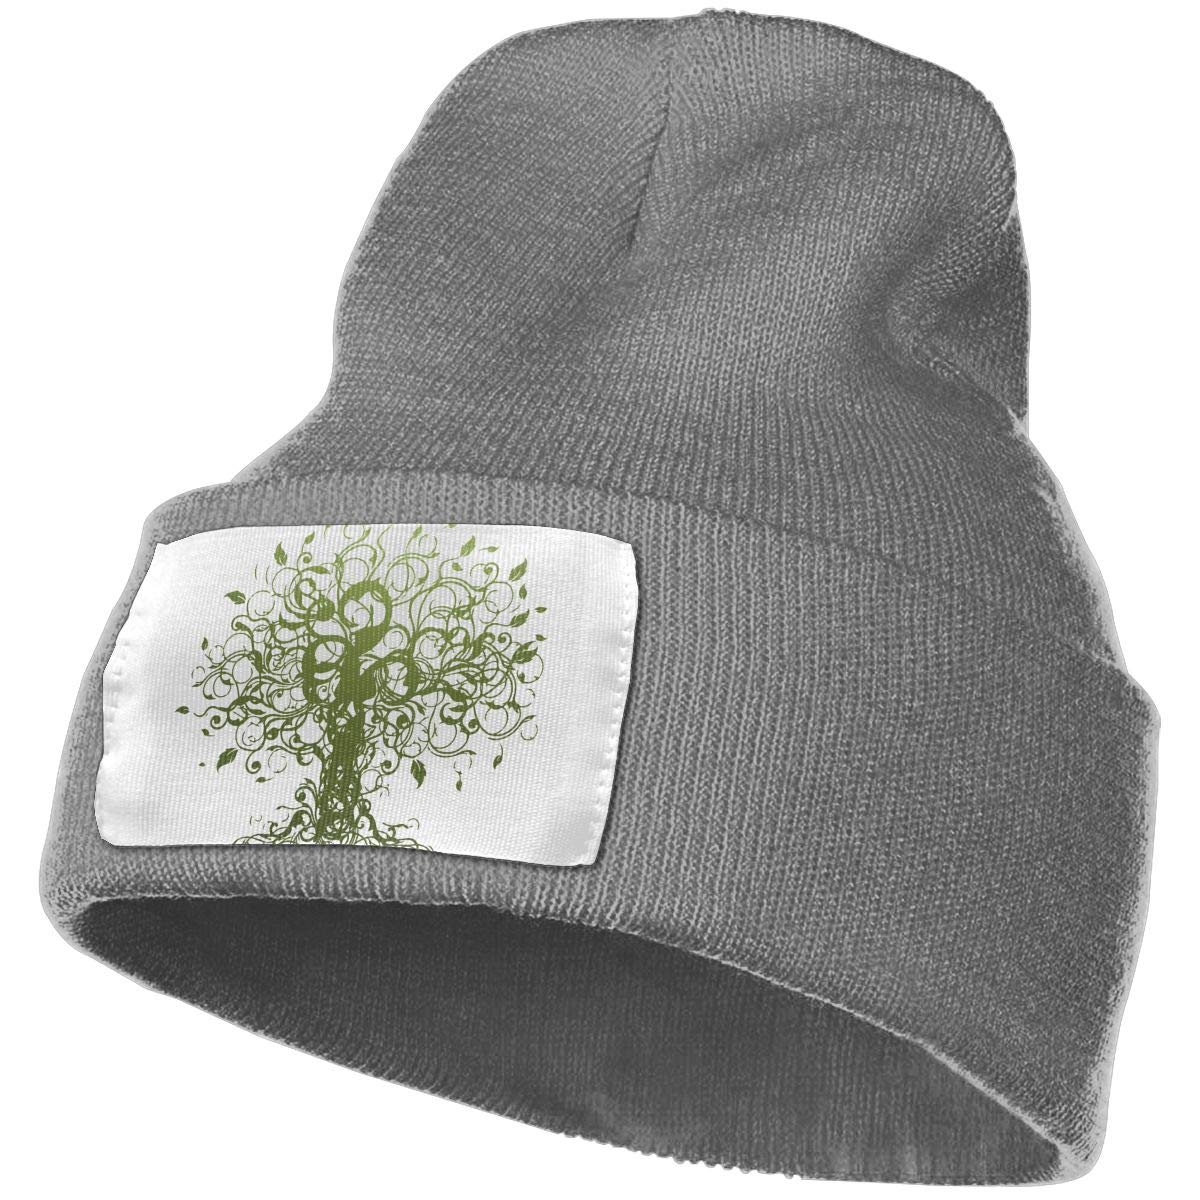 Meditation Spiritual Tree Beanie Hat Cuffed Plain Skull Knitted Hat Stylish